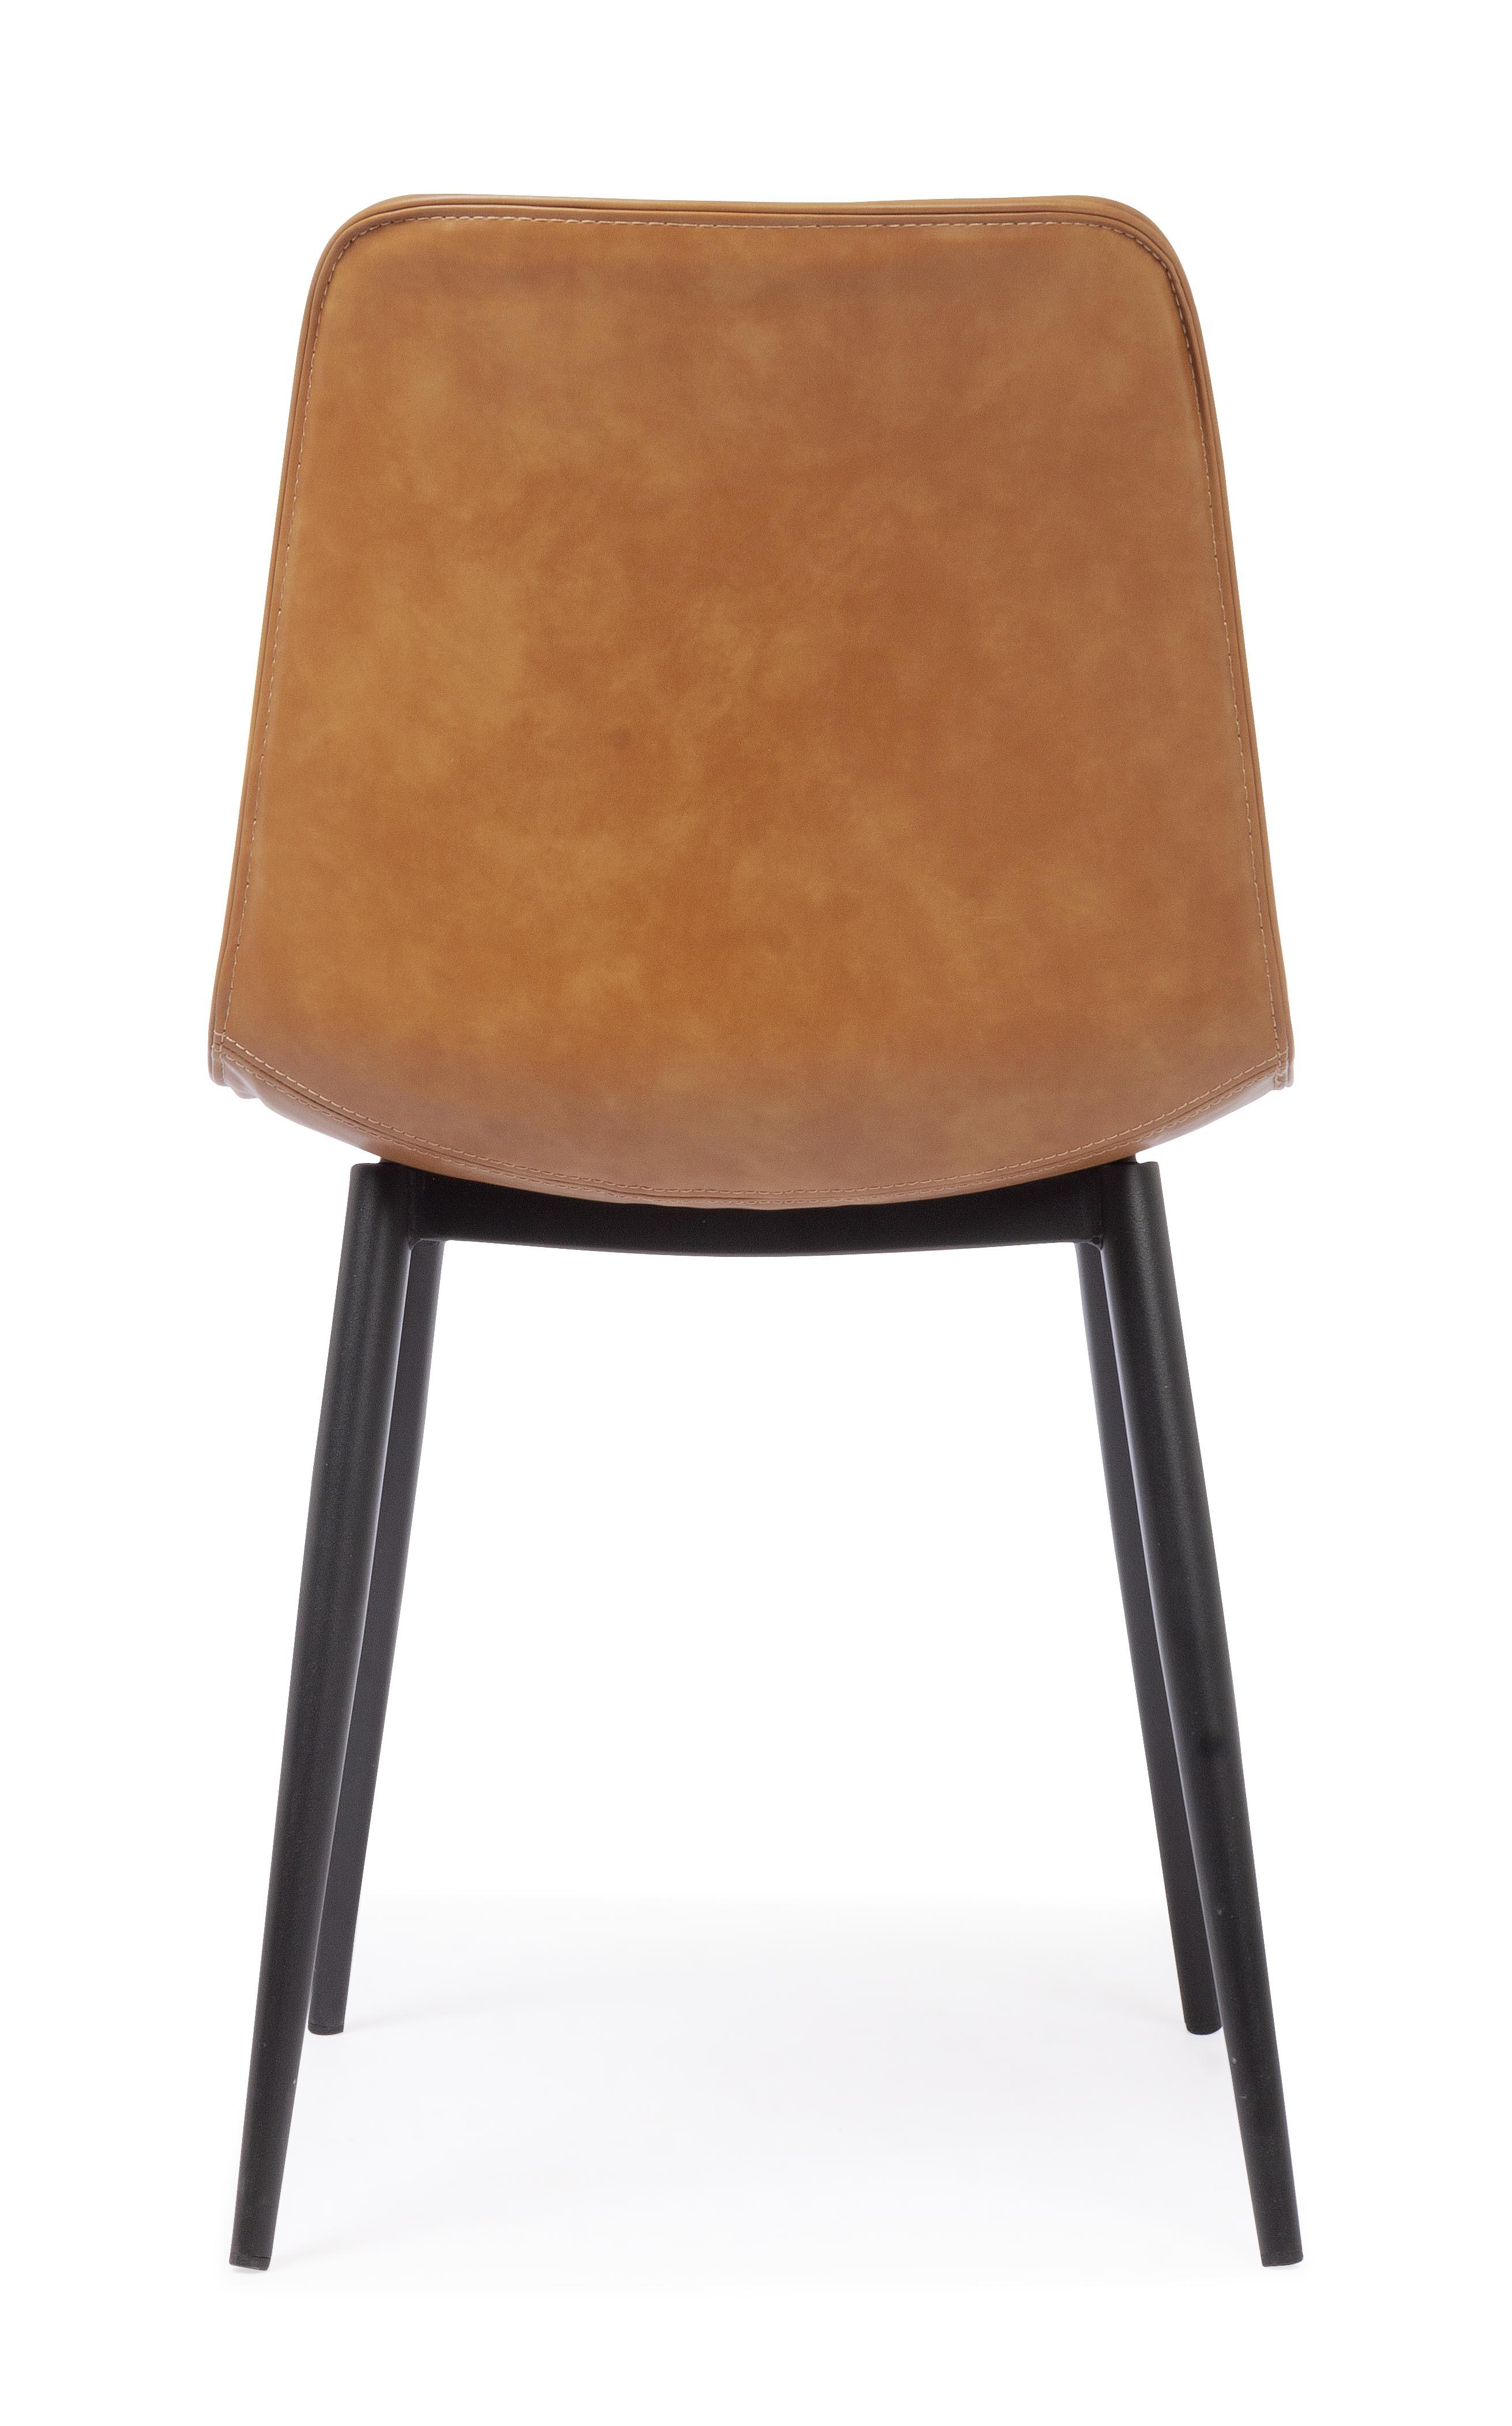 6 Stühle Kyra Pu  05